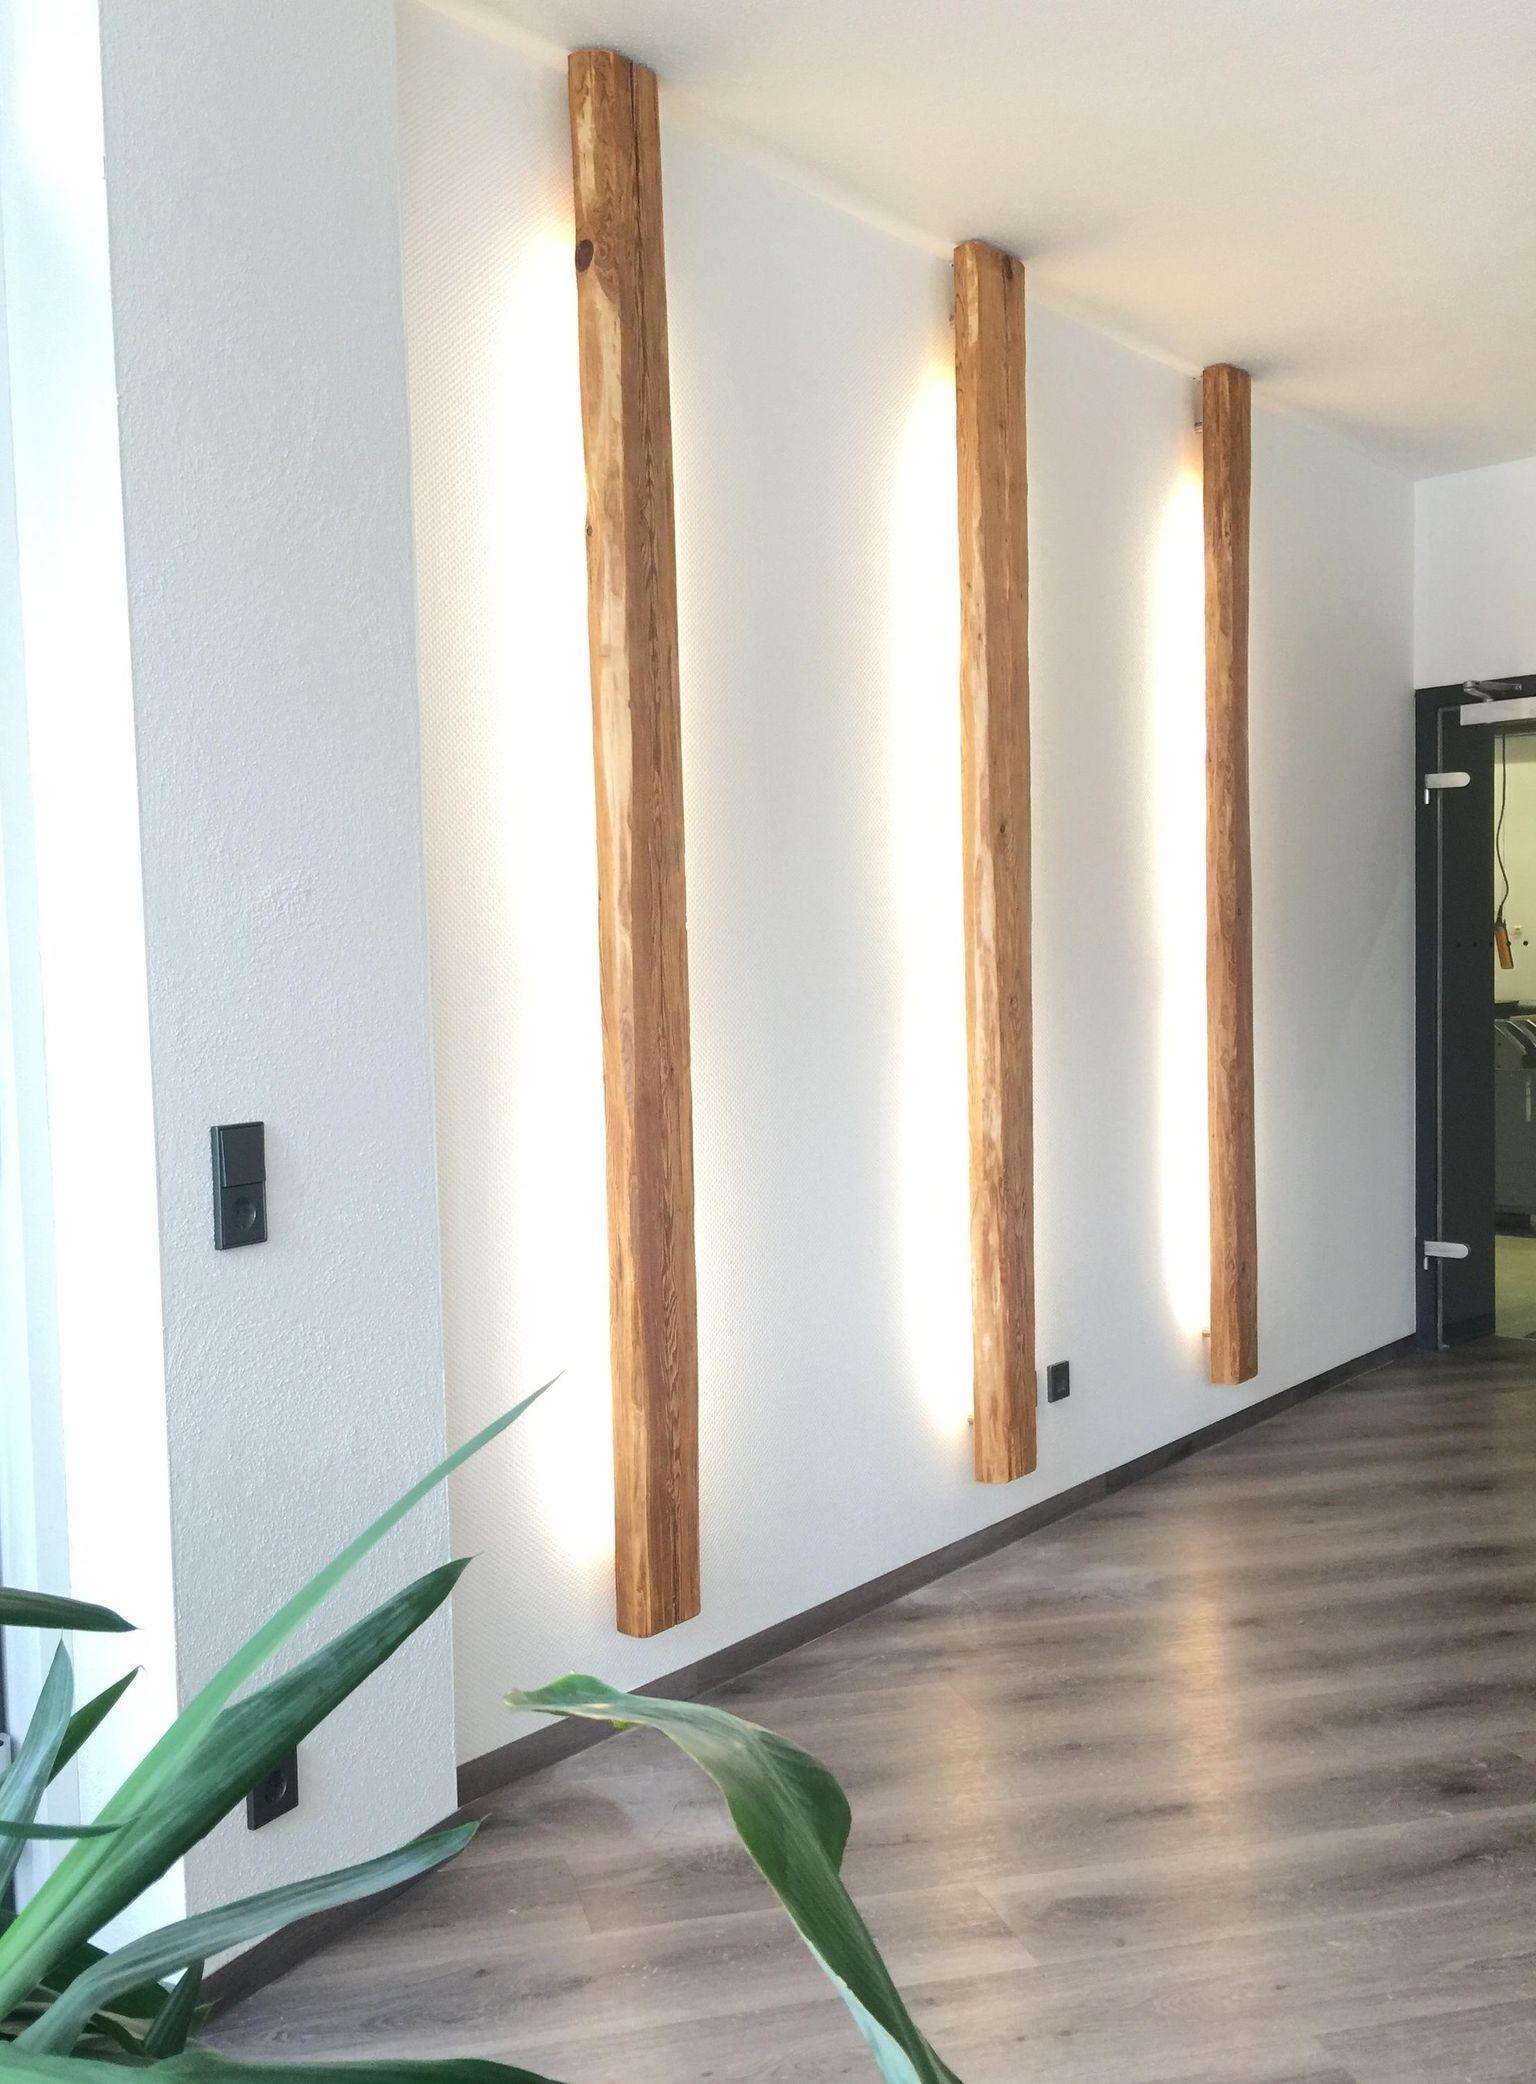 Blickfang Aus Altholz Lampe Living Beleuchtung Altholz Lampe Haus Innenarchitektur Altholz